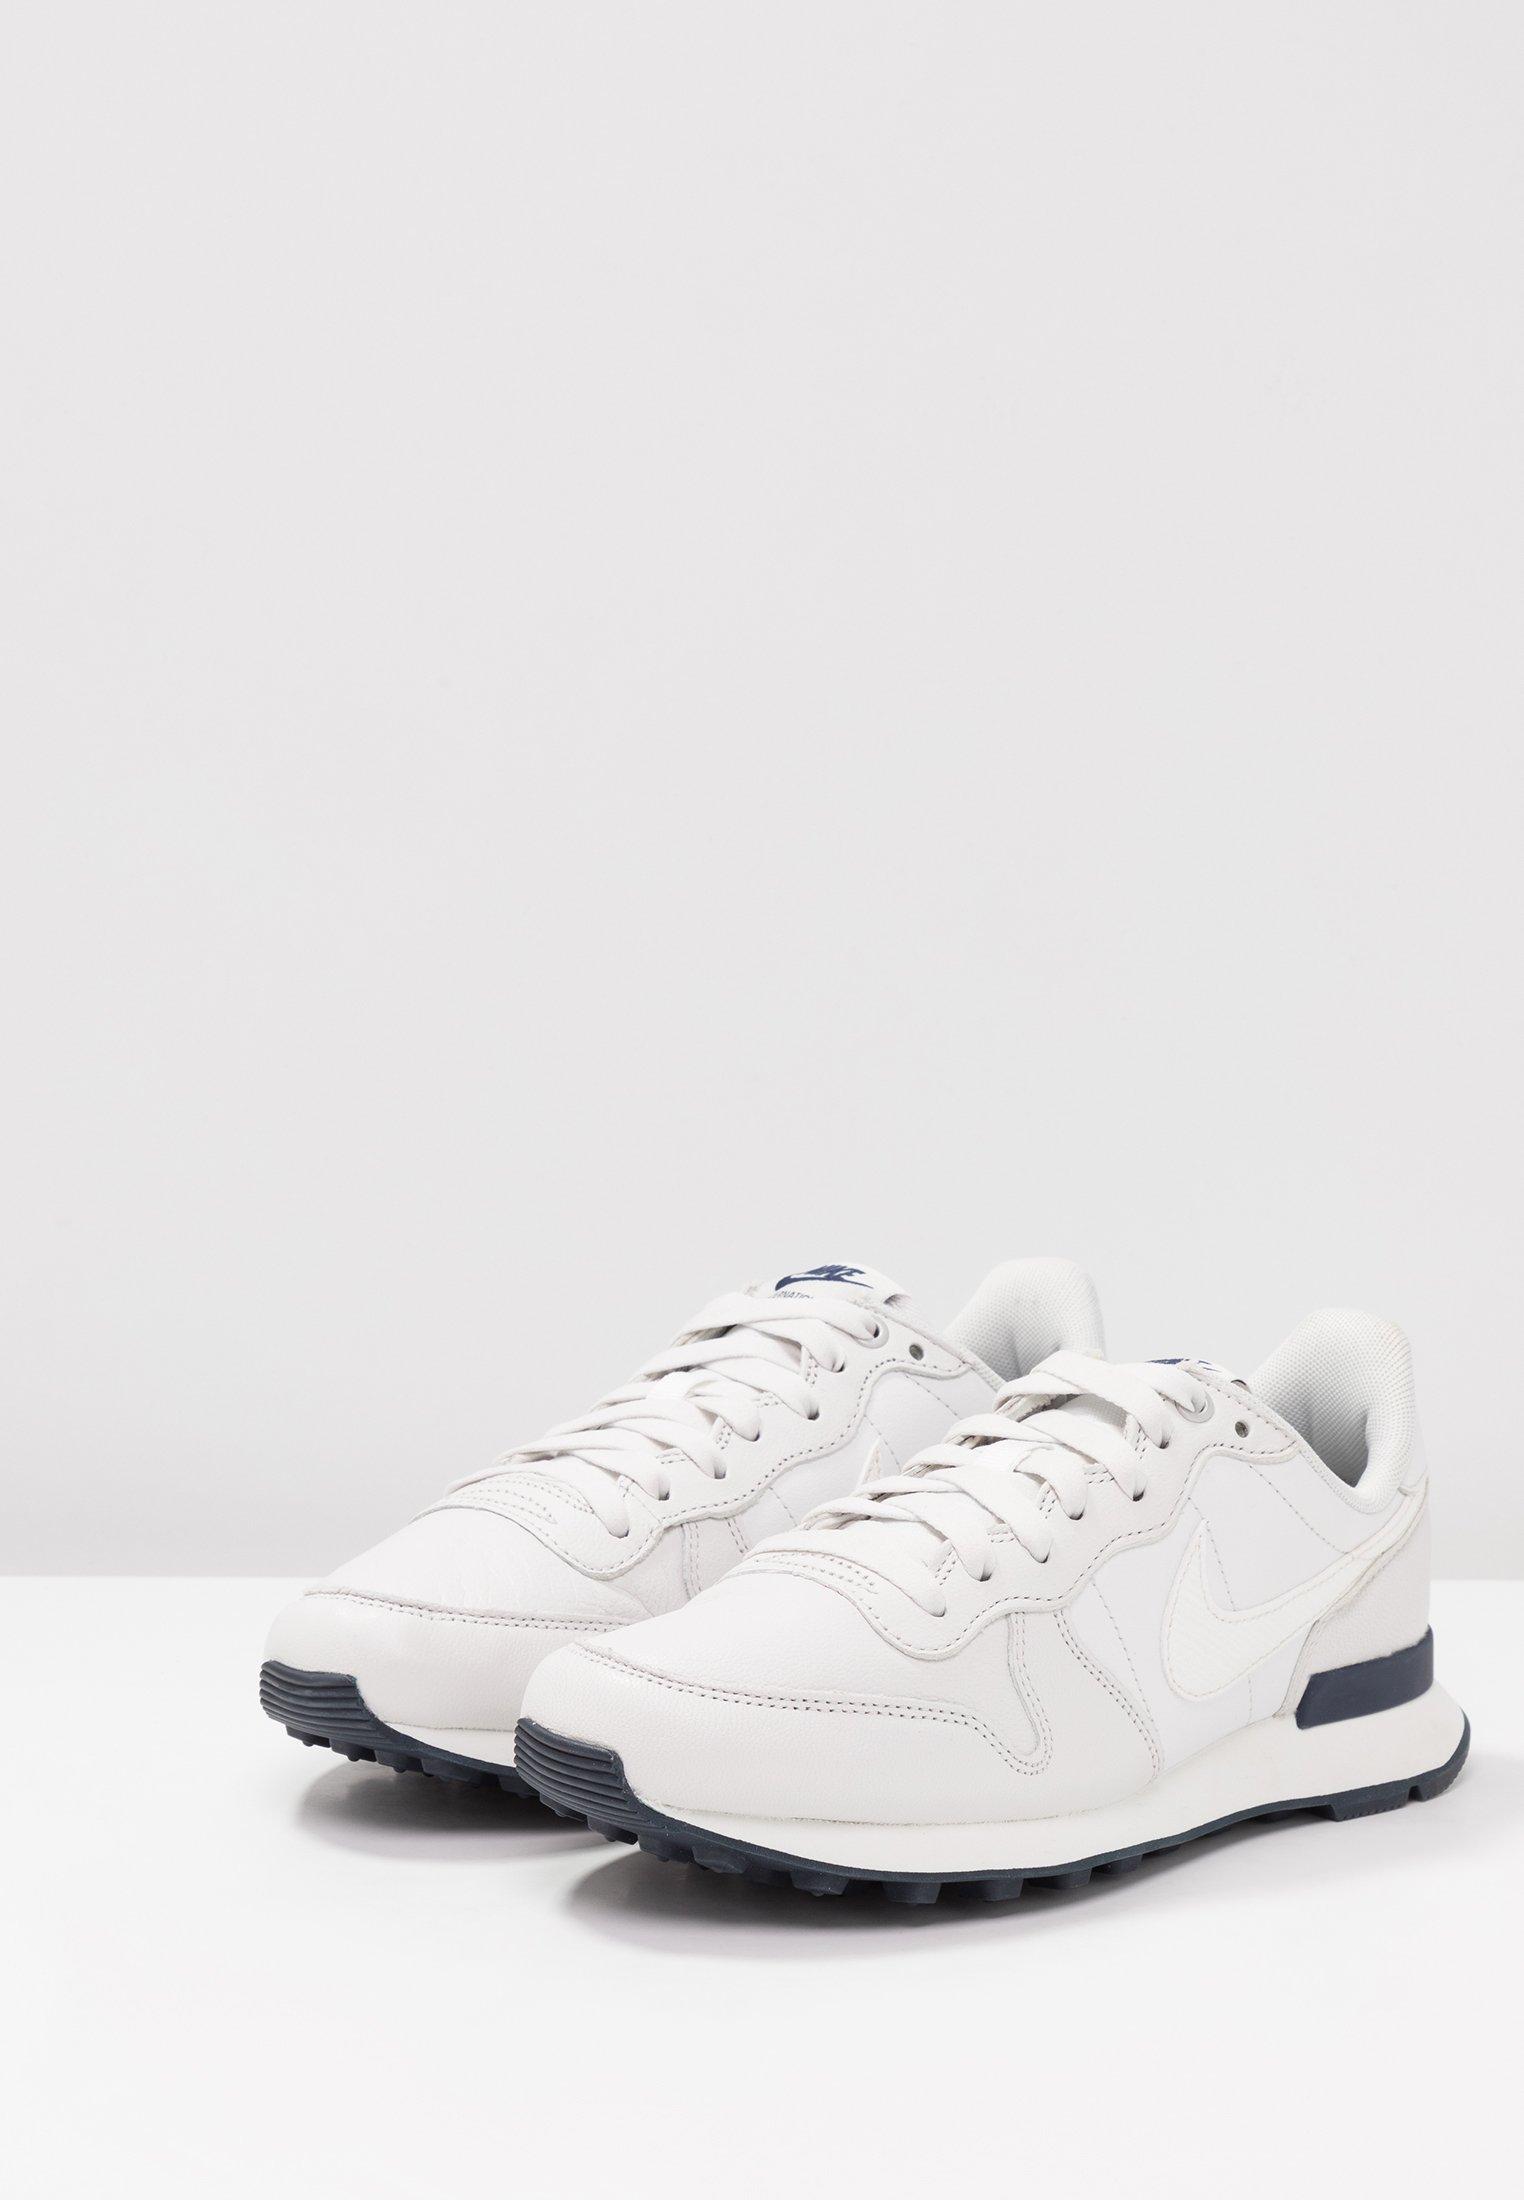 Platinum Tint Nike obsidian summit Basses White Sportswear metallic Summit PrmBaskets White Internationalist 0PnkwO